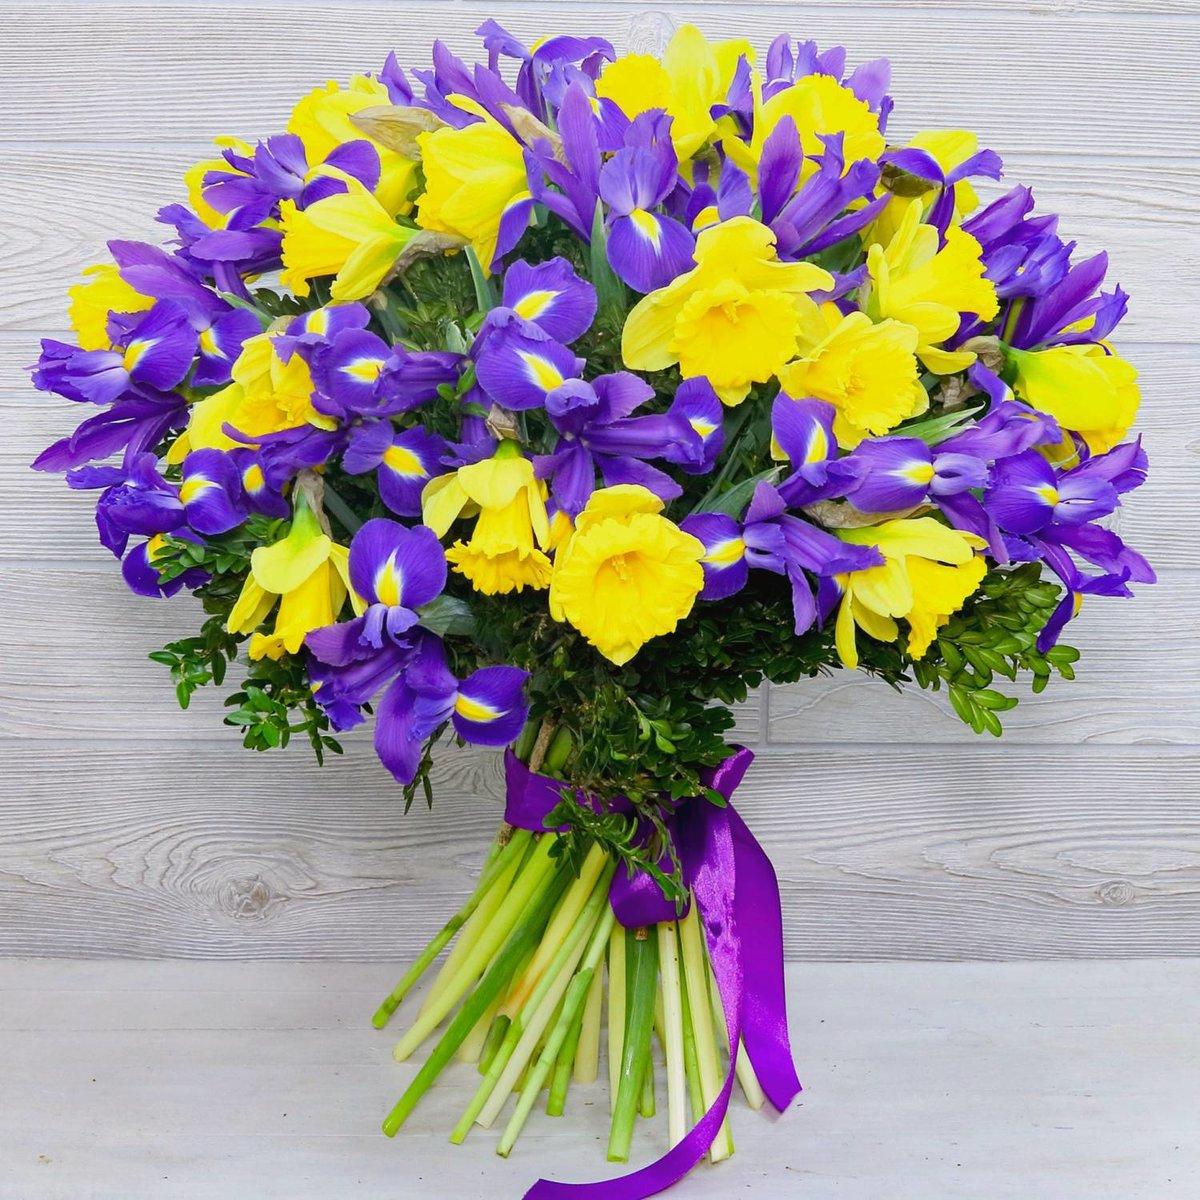 Цветов санкт-петербургу, салон букетов ирисов